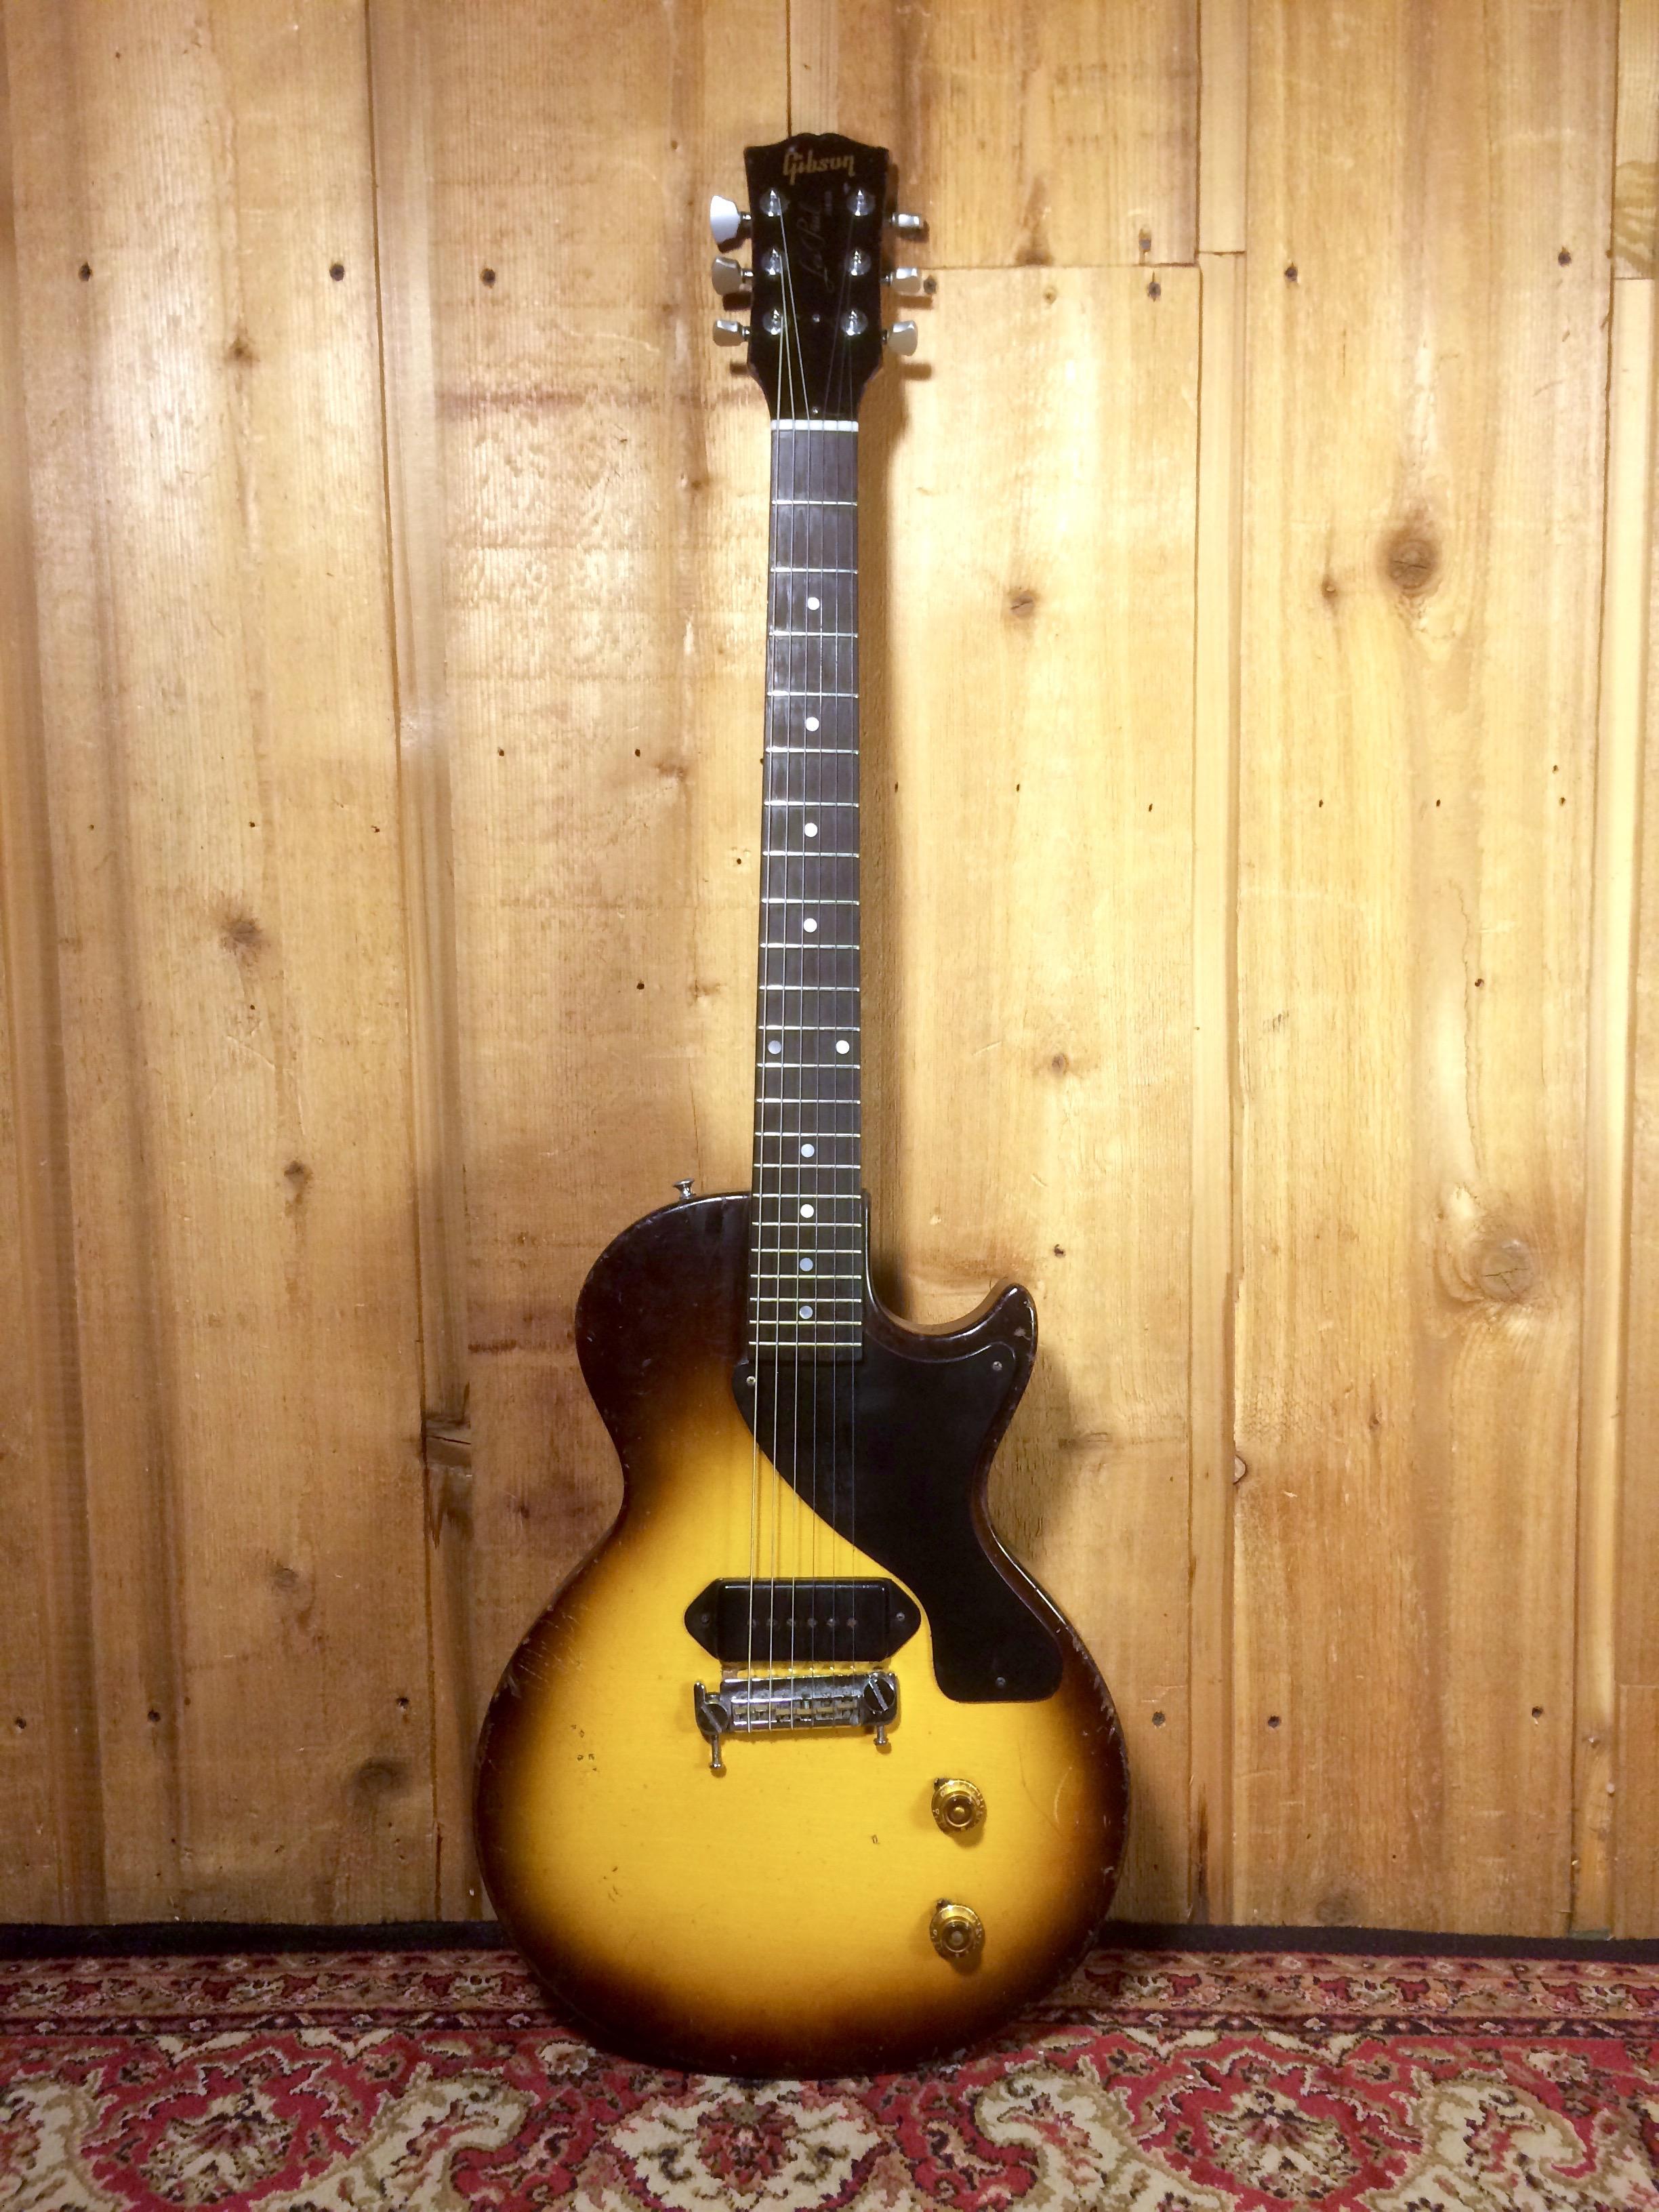 1954 Gibson Les Paul Jr.